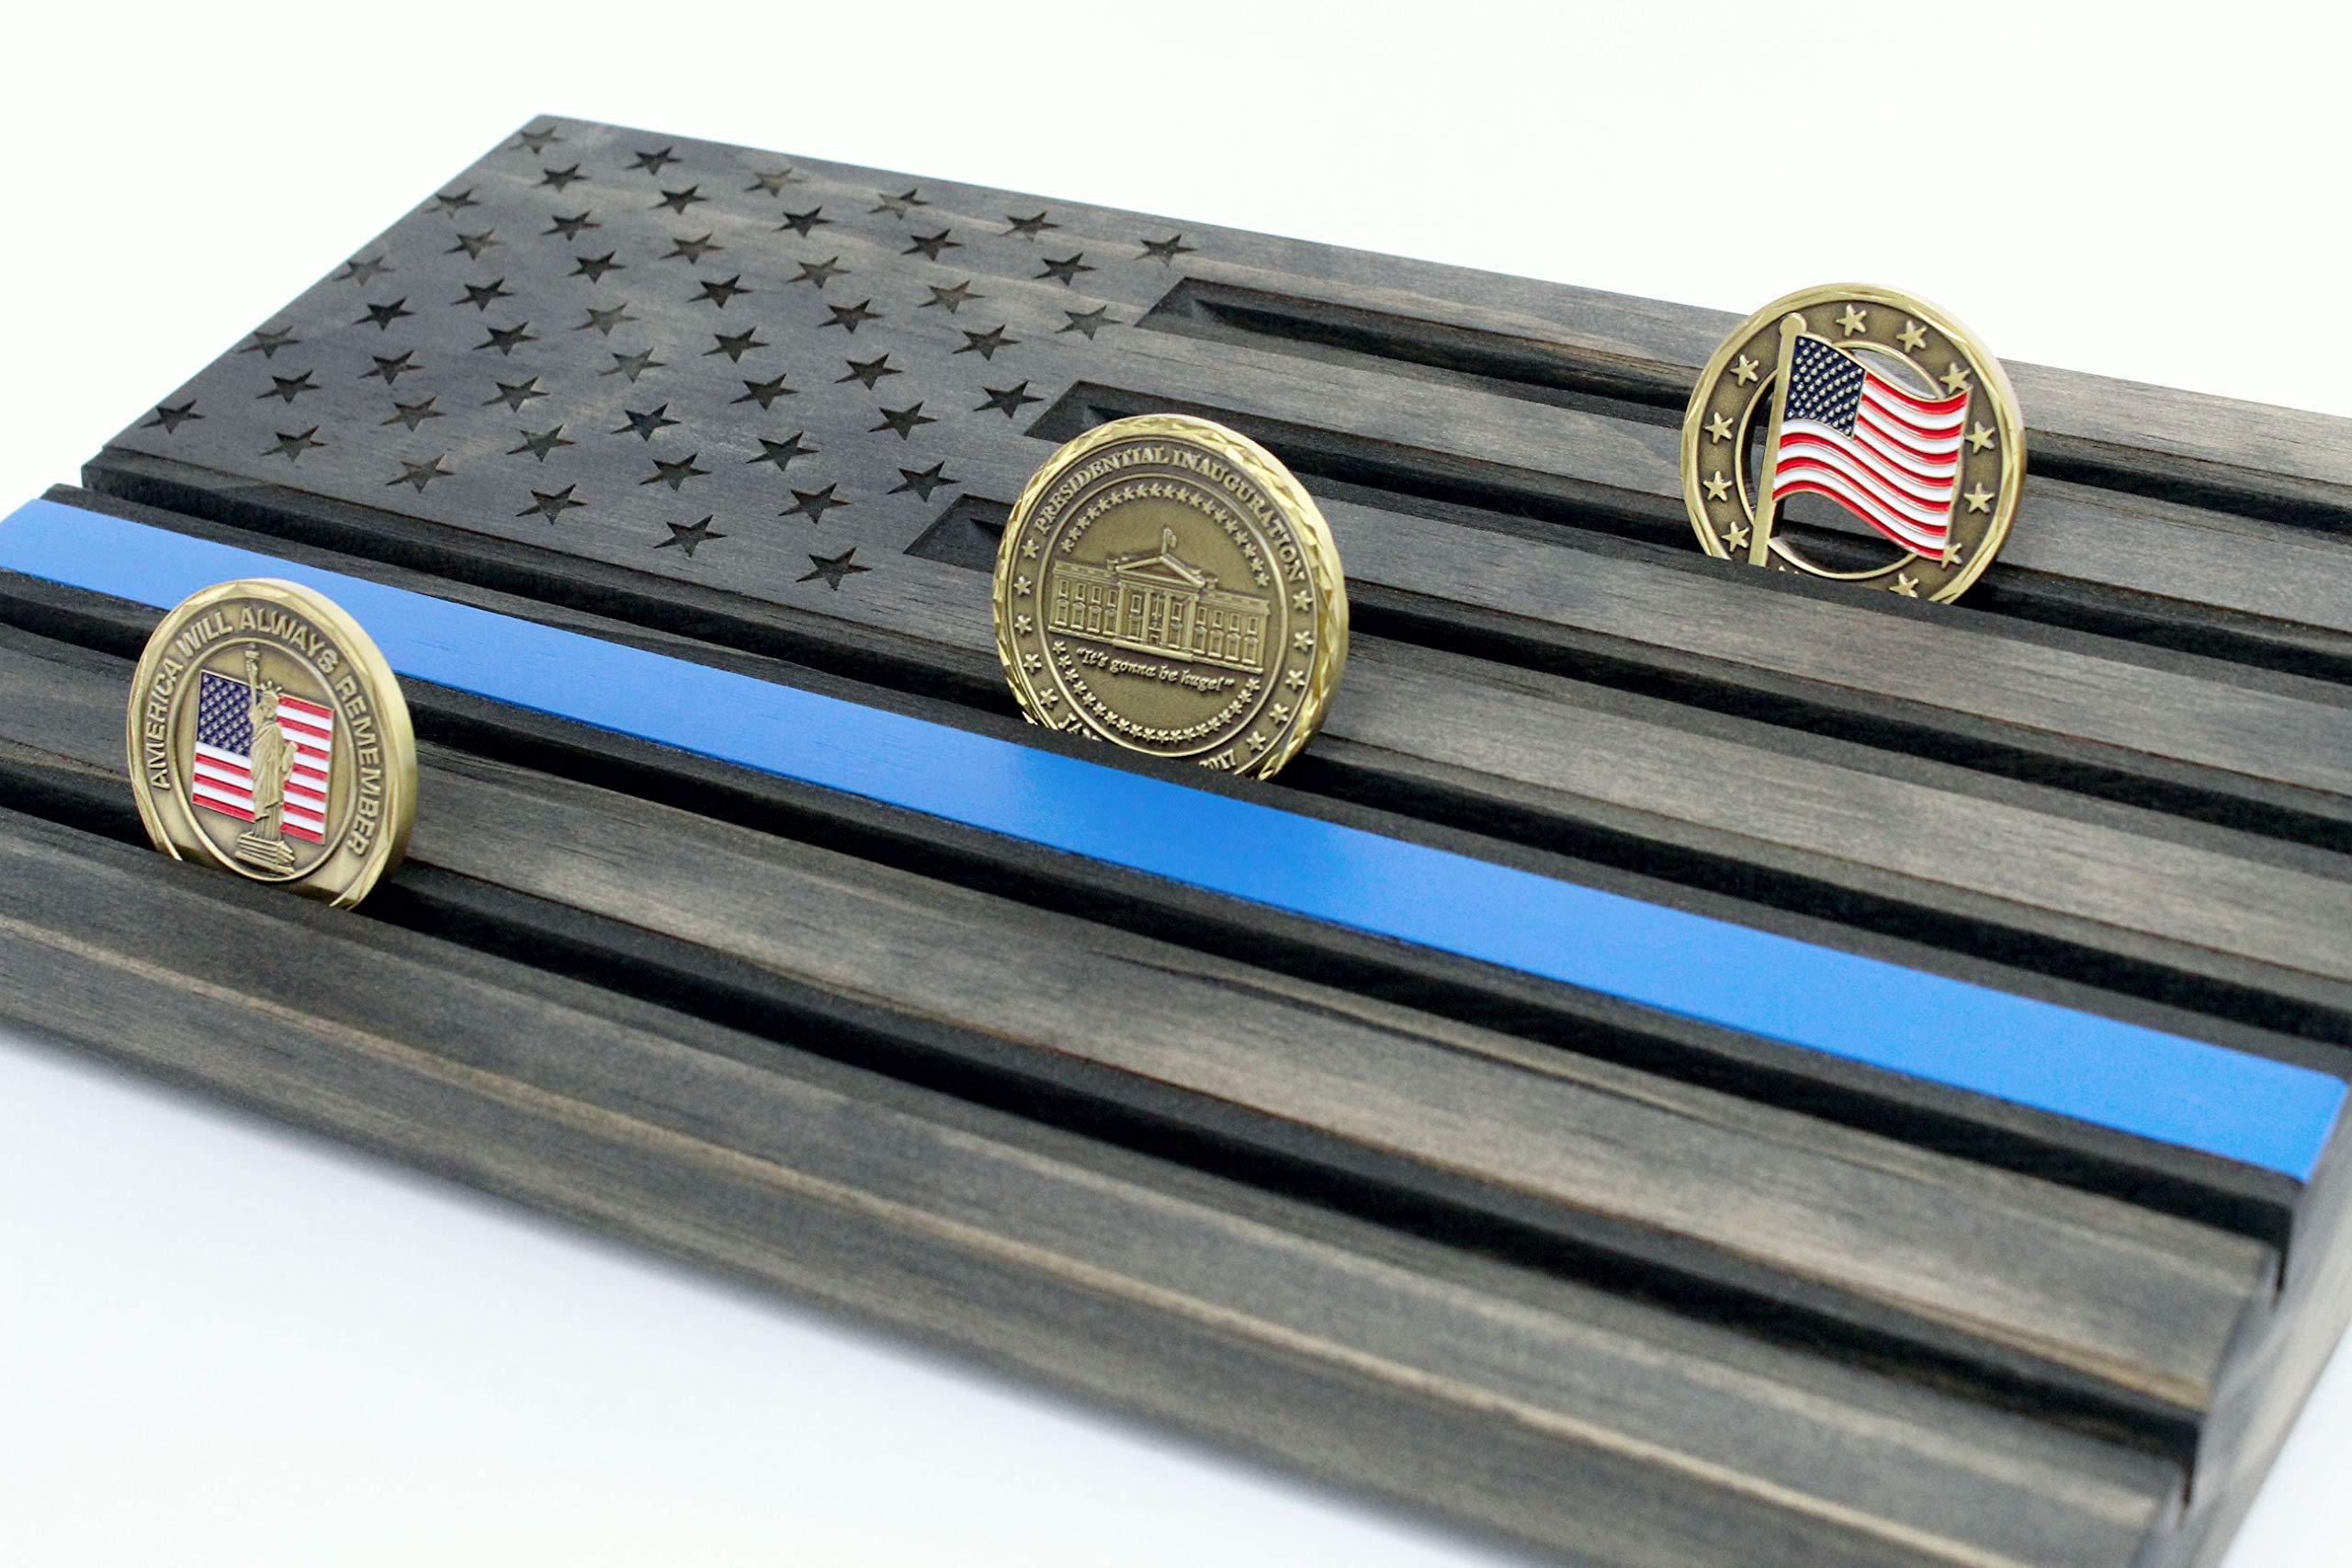 LOKI ENGRAVING Thin Blue Line Black American Flag Challenge Coin Display